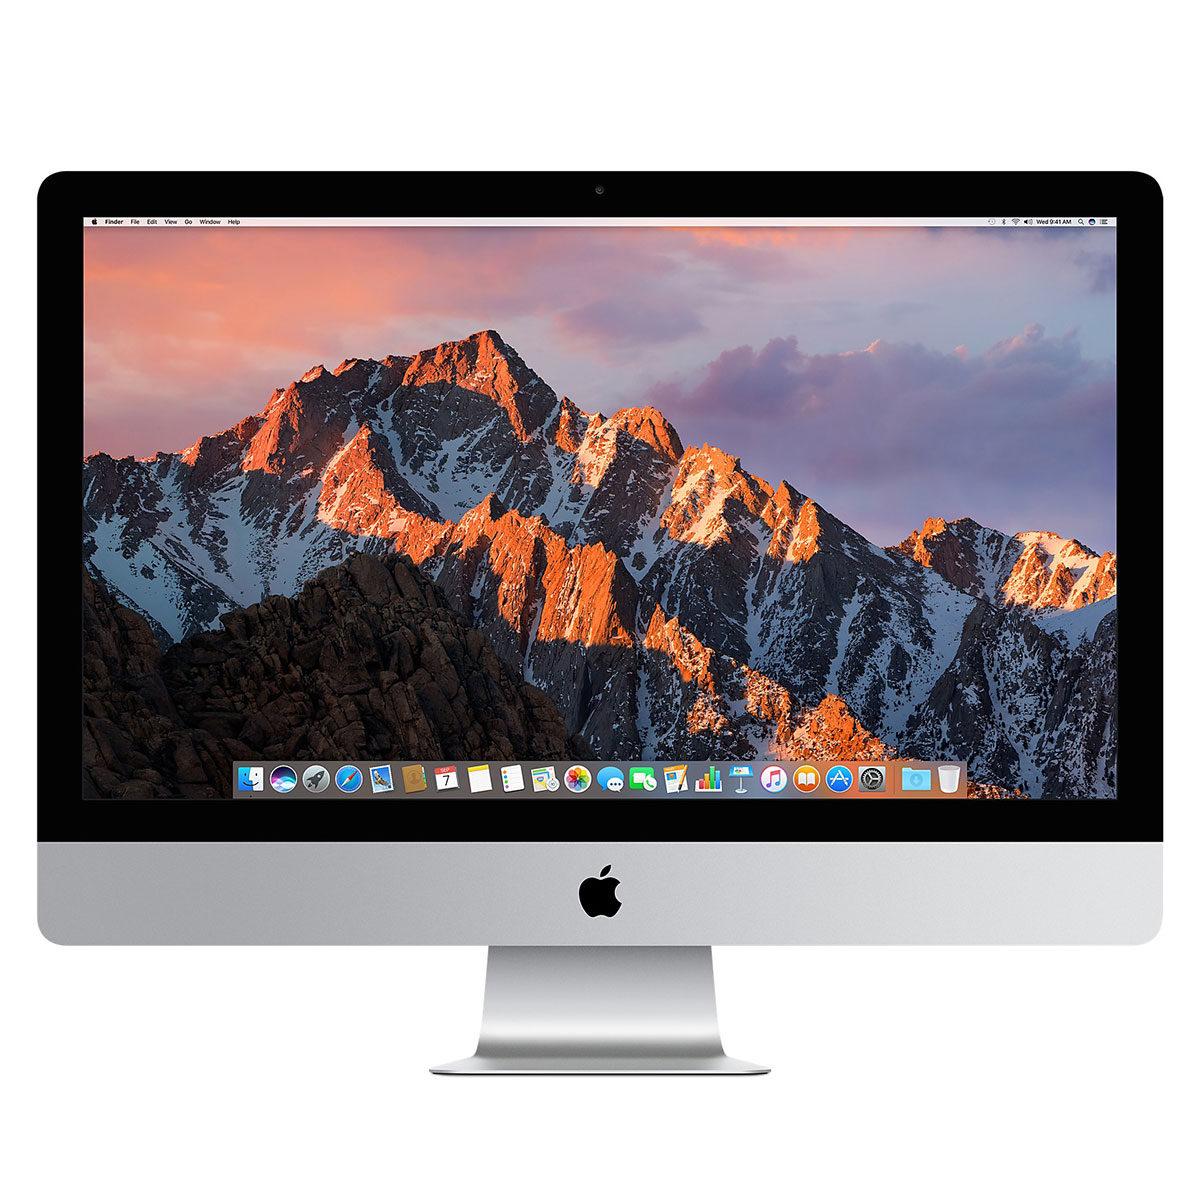 Afbeelding van Apple iMac 27 inch Retina 5K Core i5 3.5GHz Quadcore (MNEA2N/A)